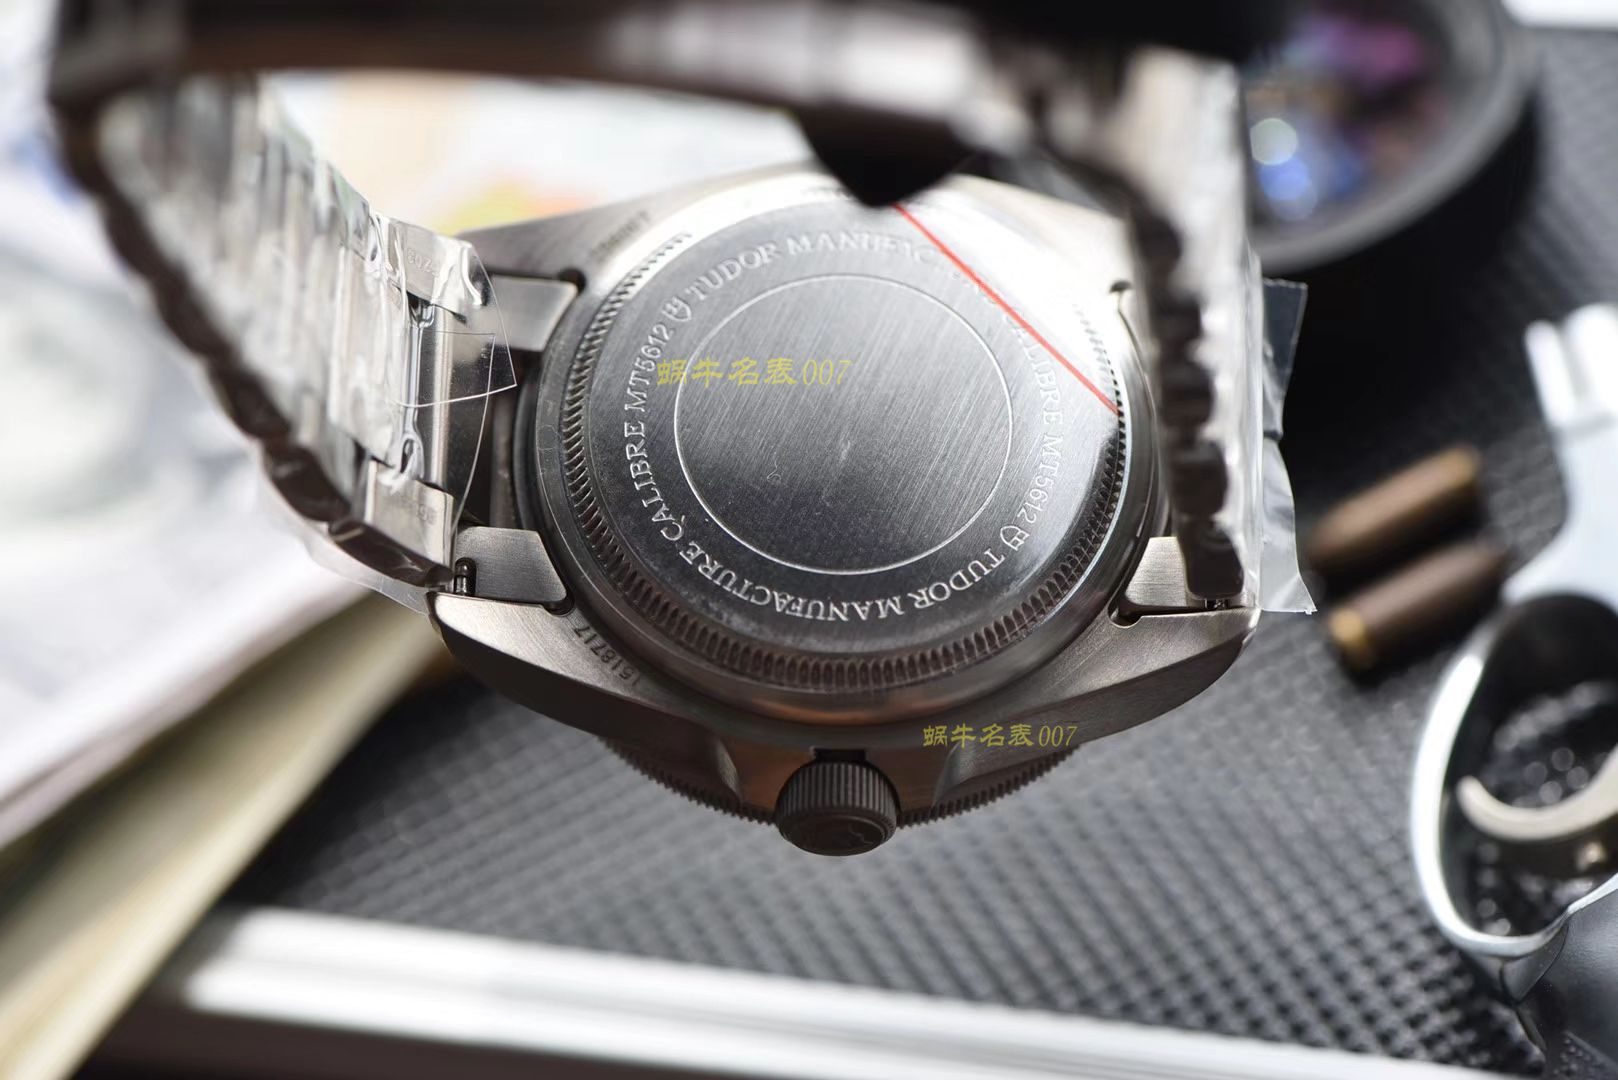 【XF厂最新~终极版帝舵蓝土豆】帝舵PELAGOS系列25600TB腕表 / DT036